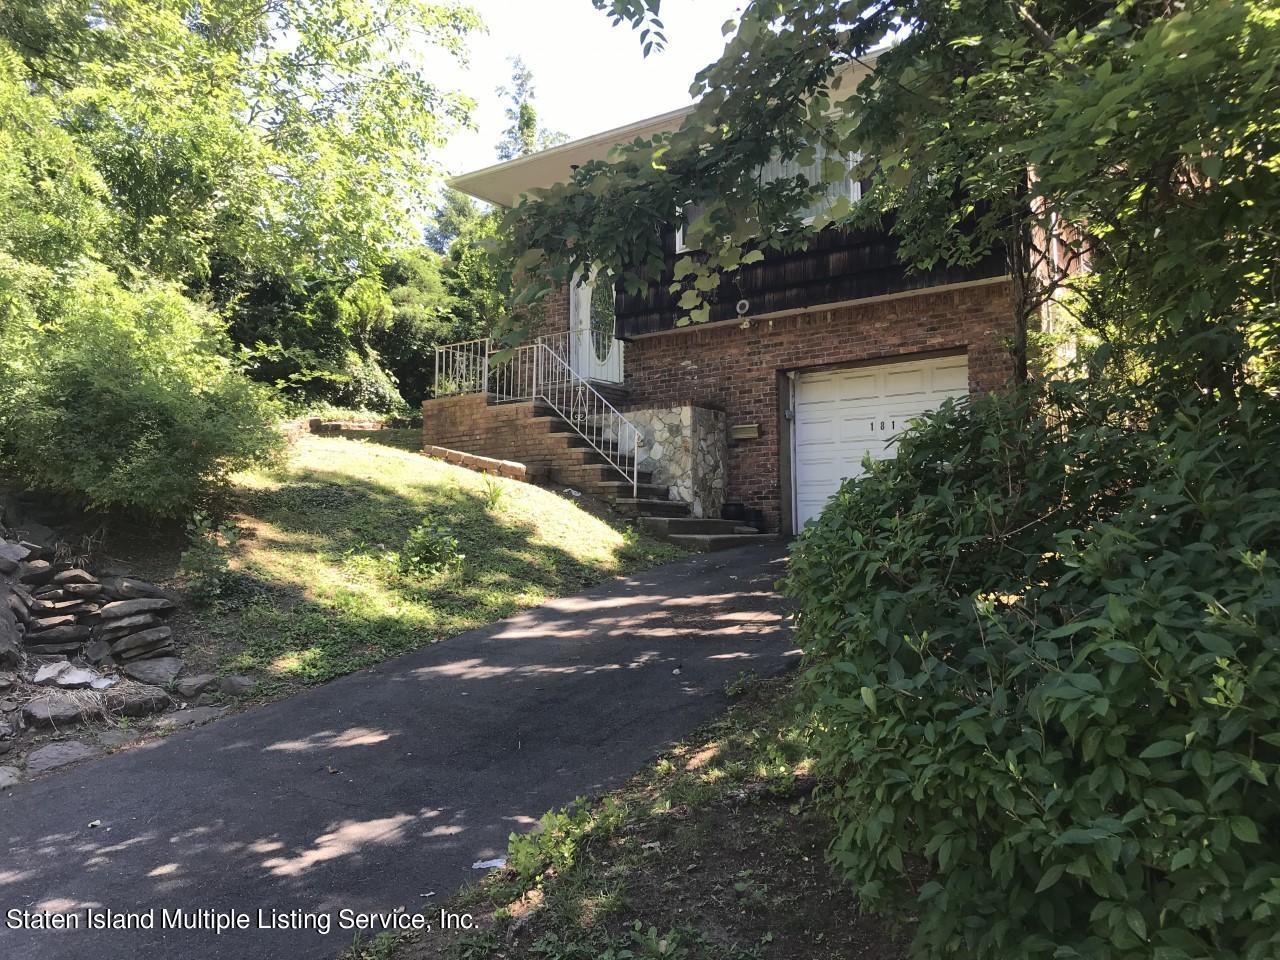 Single Family - Detached 181 Nelson Avenue  Staten Island, NY 10308, MLS-1147311-4